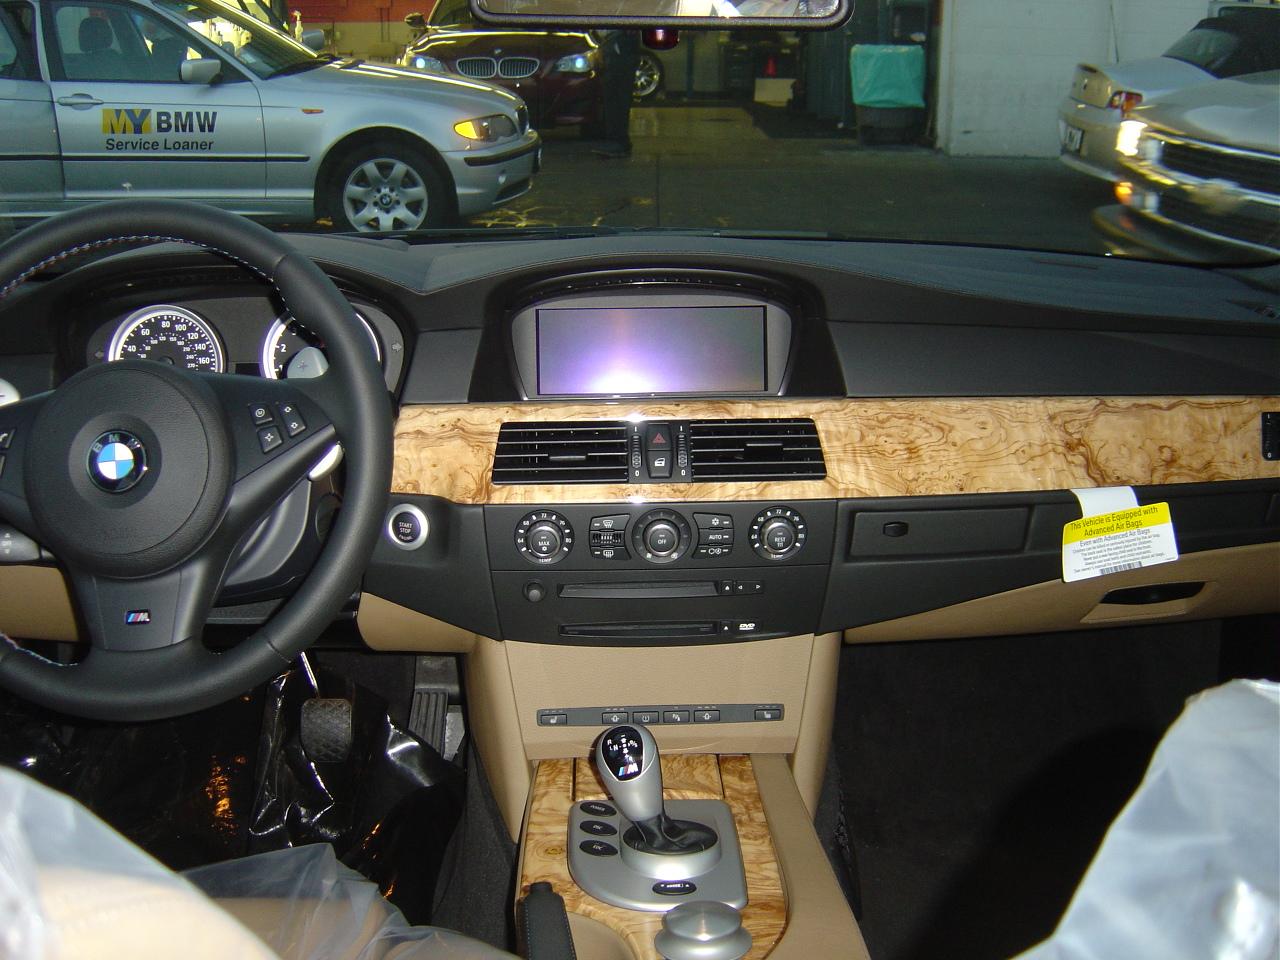 E60 03 10 For Wtt My Lci Olive Ash Carrara Wood Trim Your Alu Black Bmw M5 Forum And M6 Forums